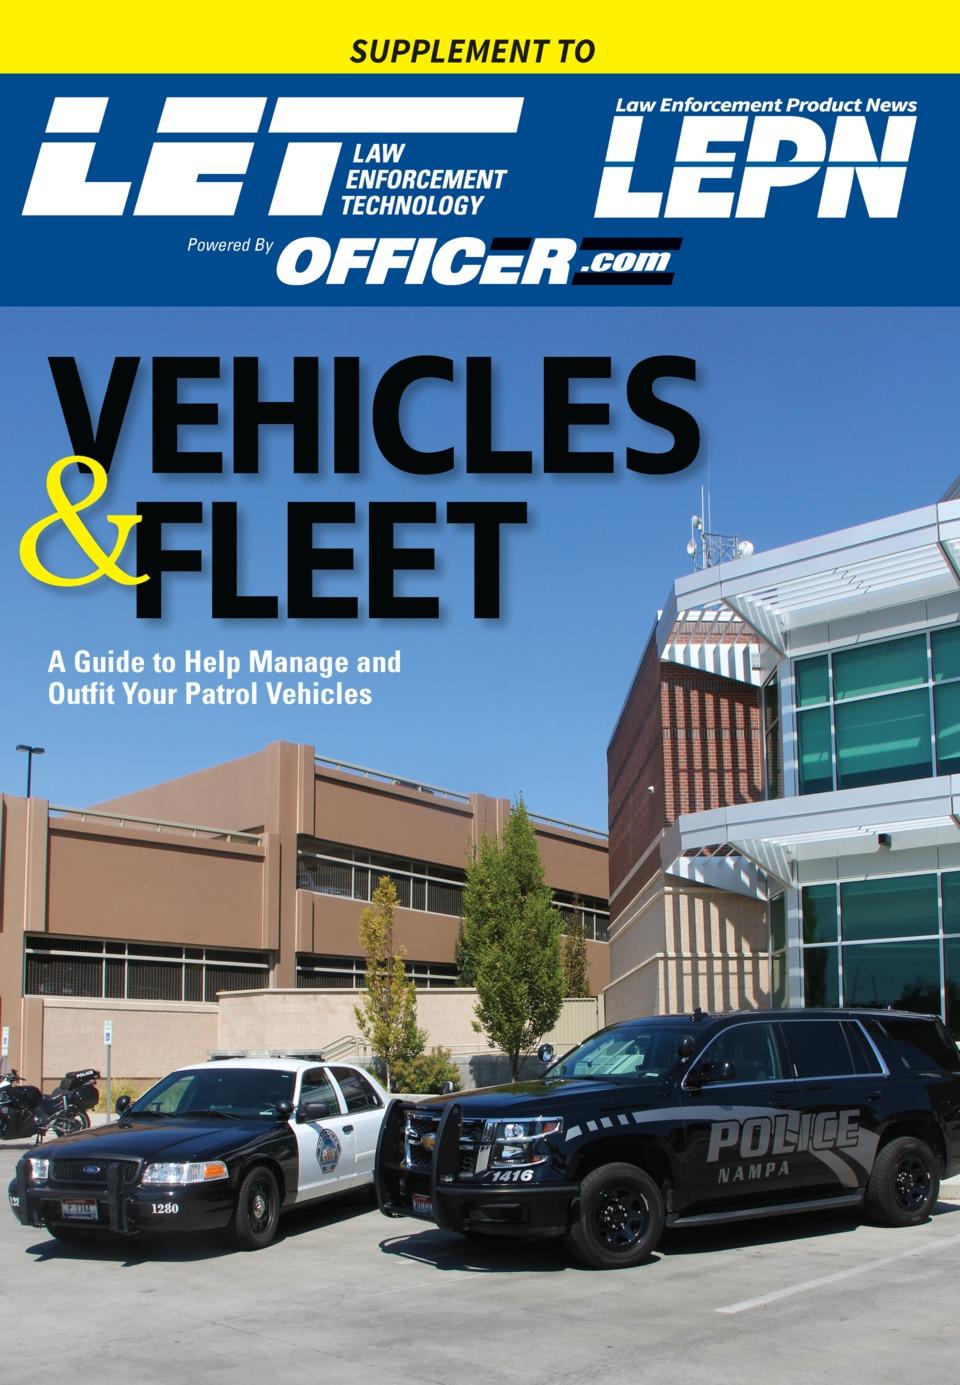 Law Enforcement Patrol Vehicle and Fleet Supplement